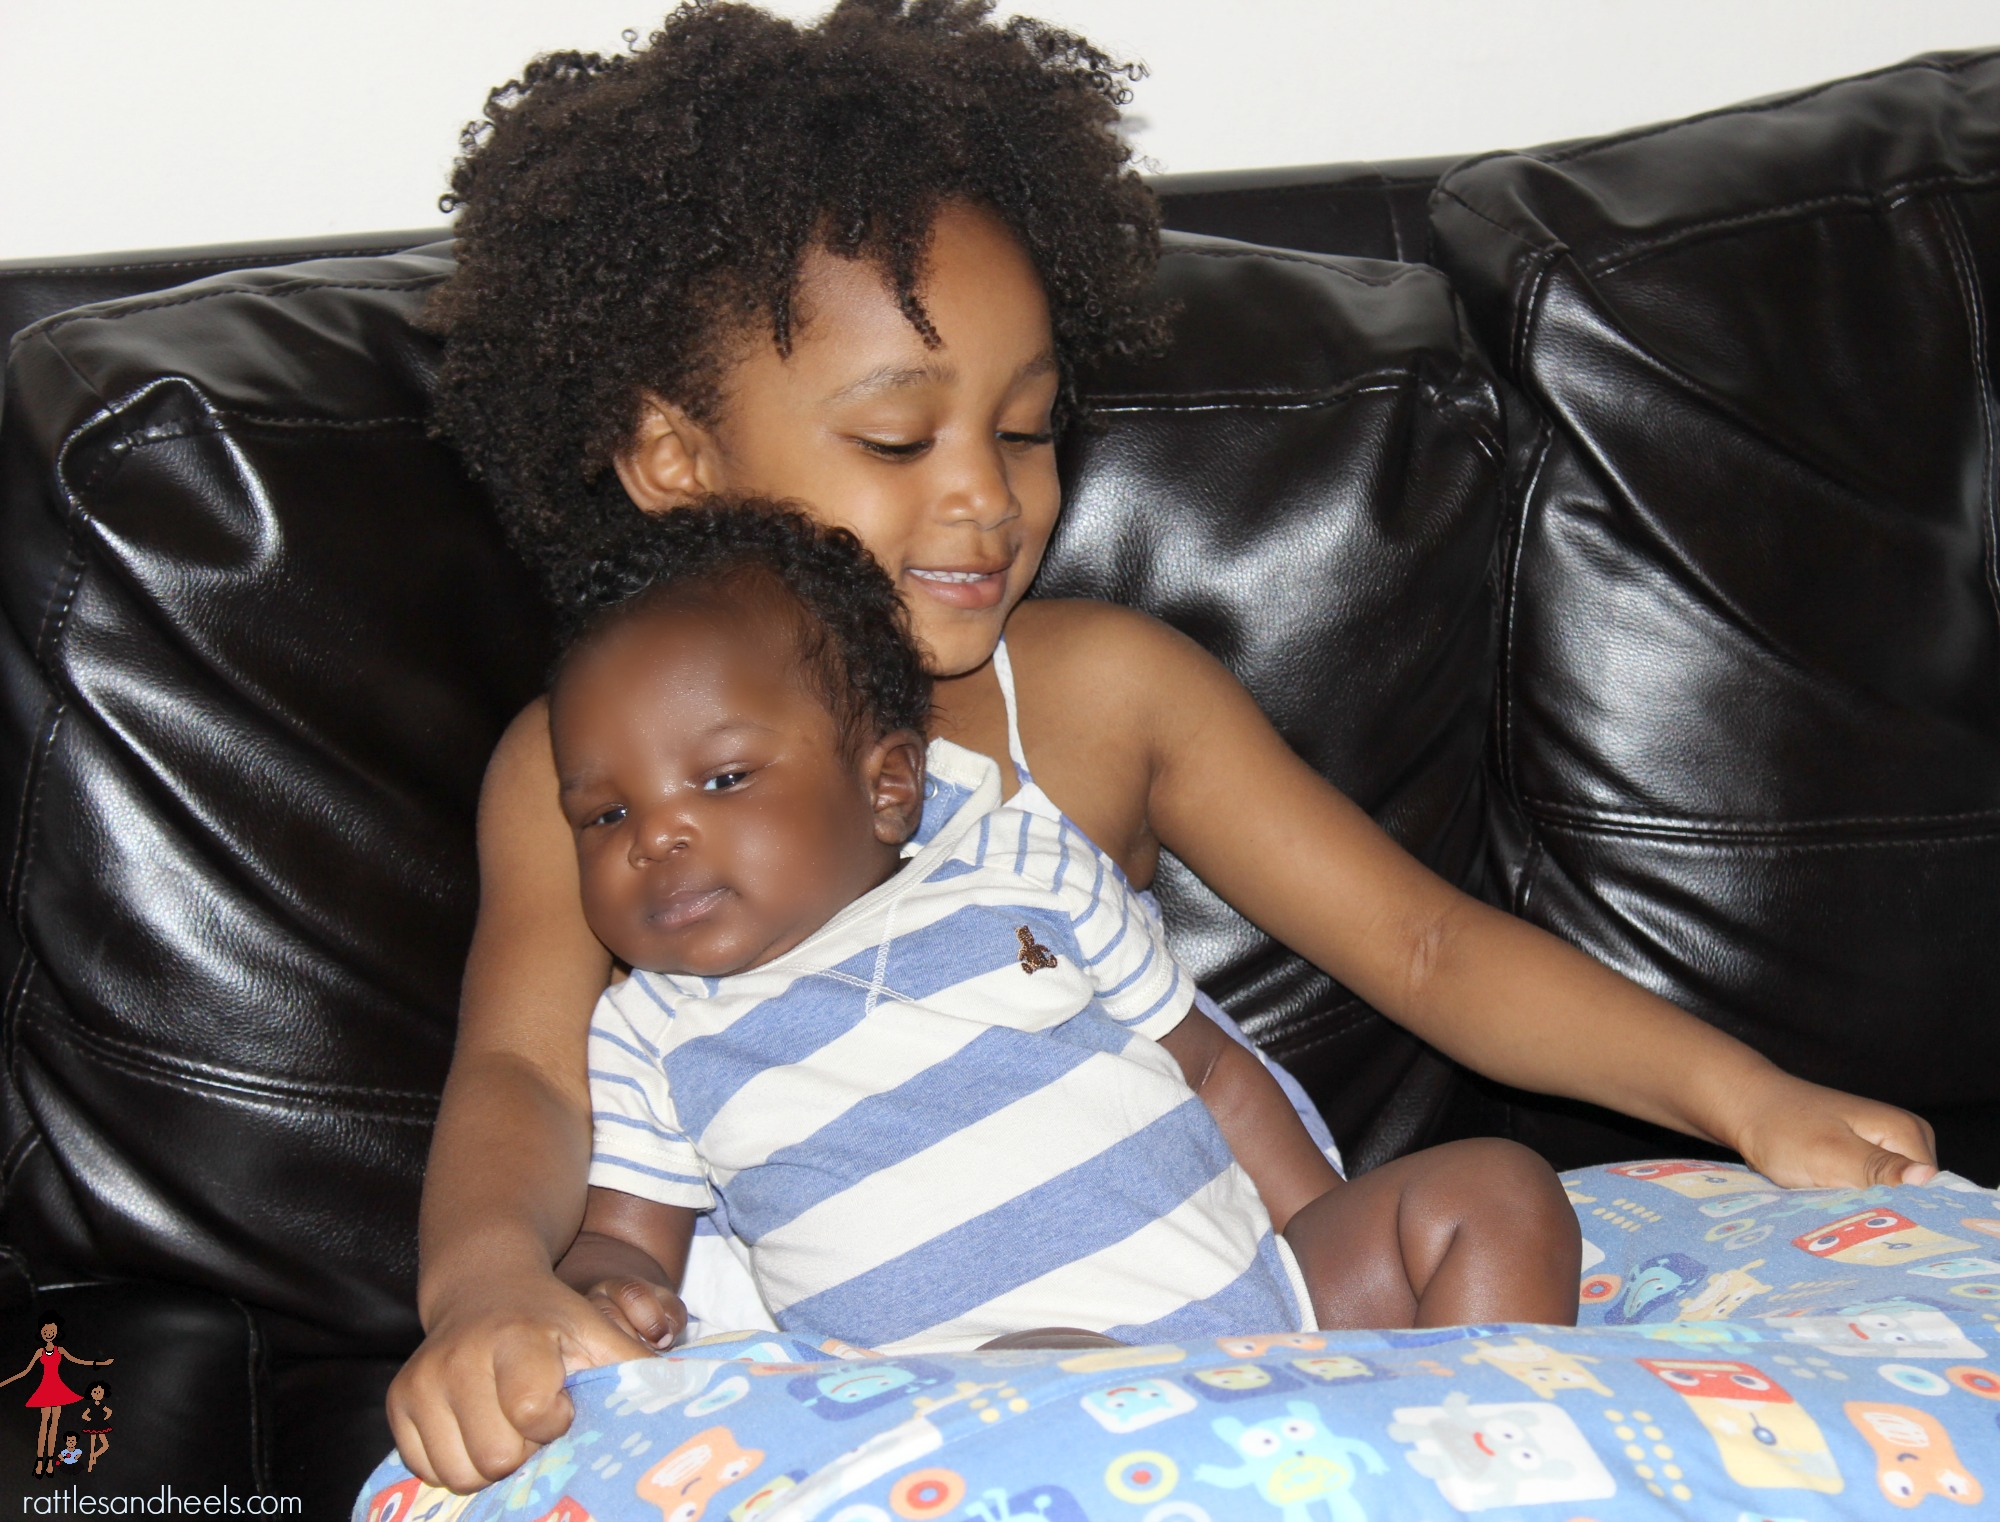 Toddler-and-newborn-bond